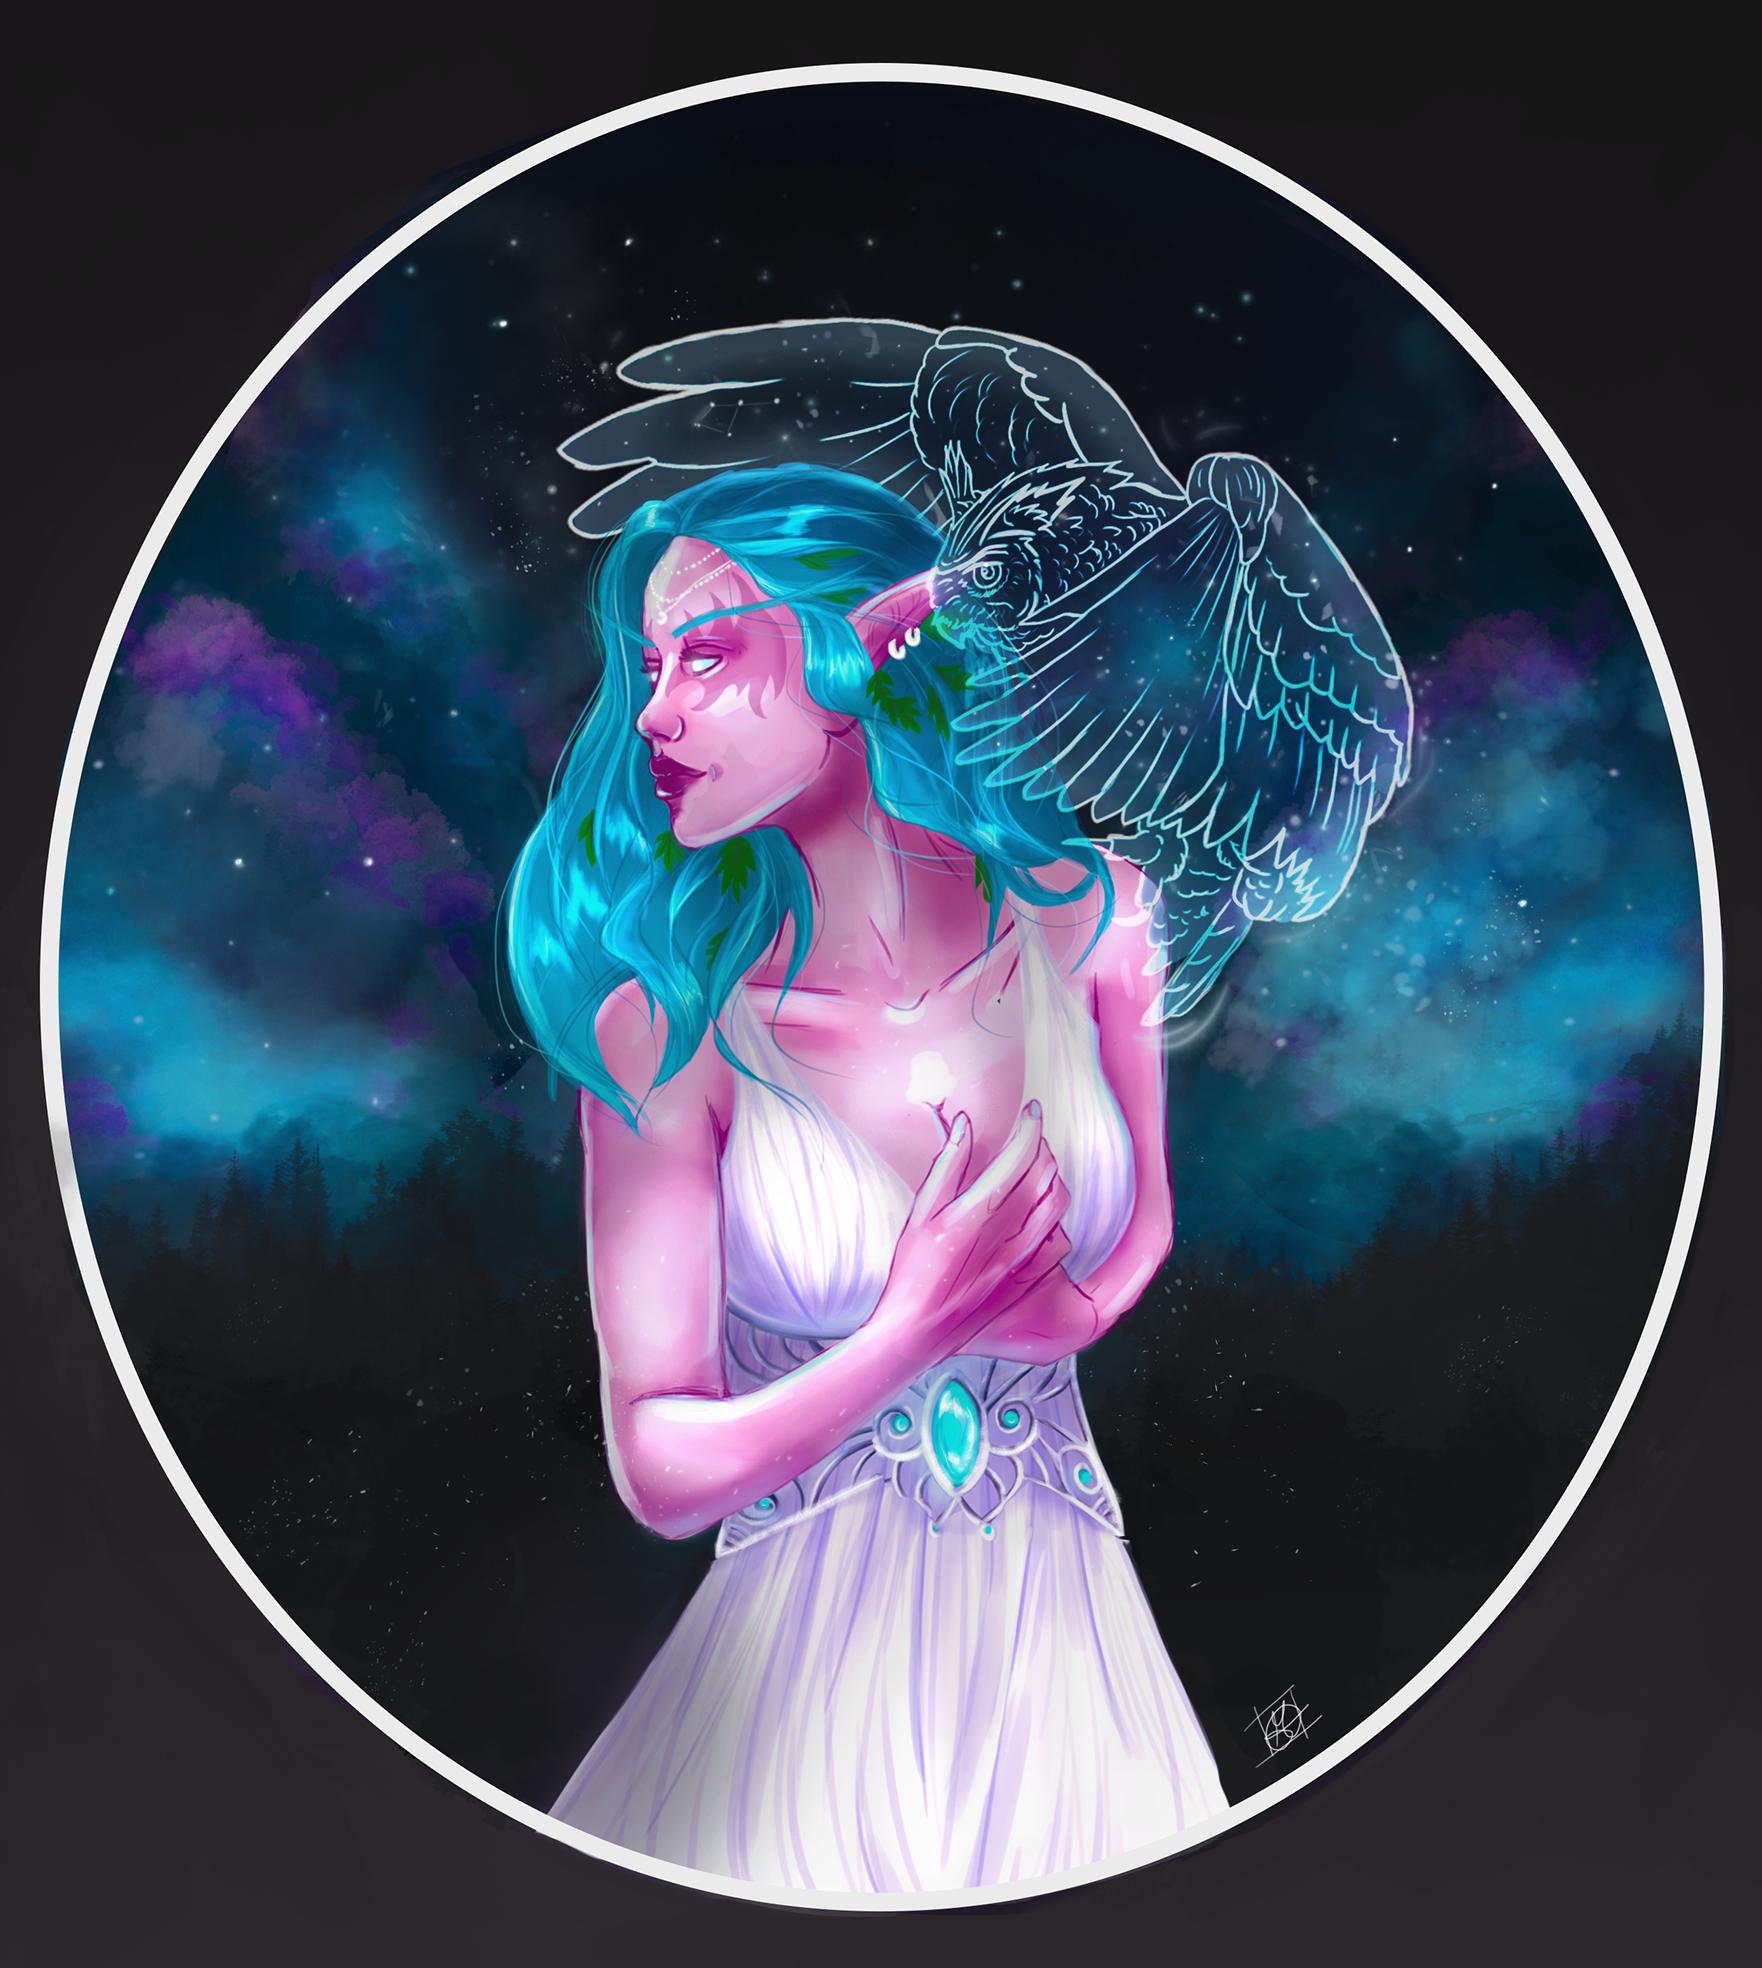 Tyrande Whisperwind by MissMorinth